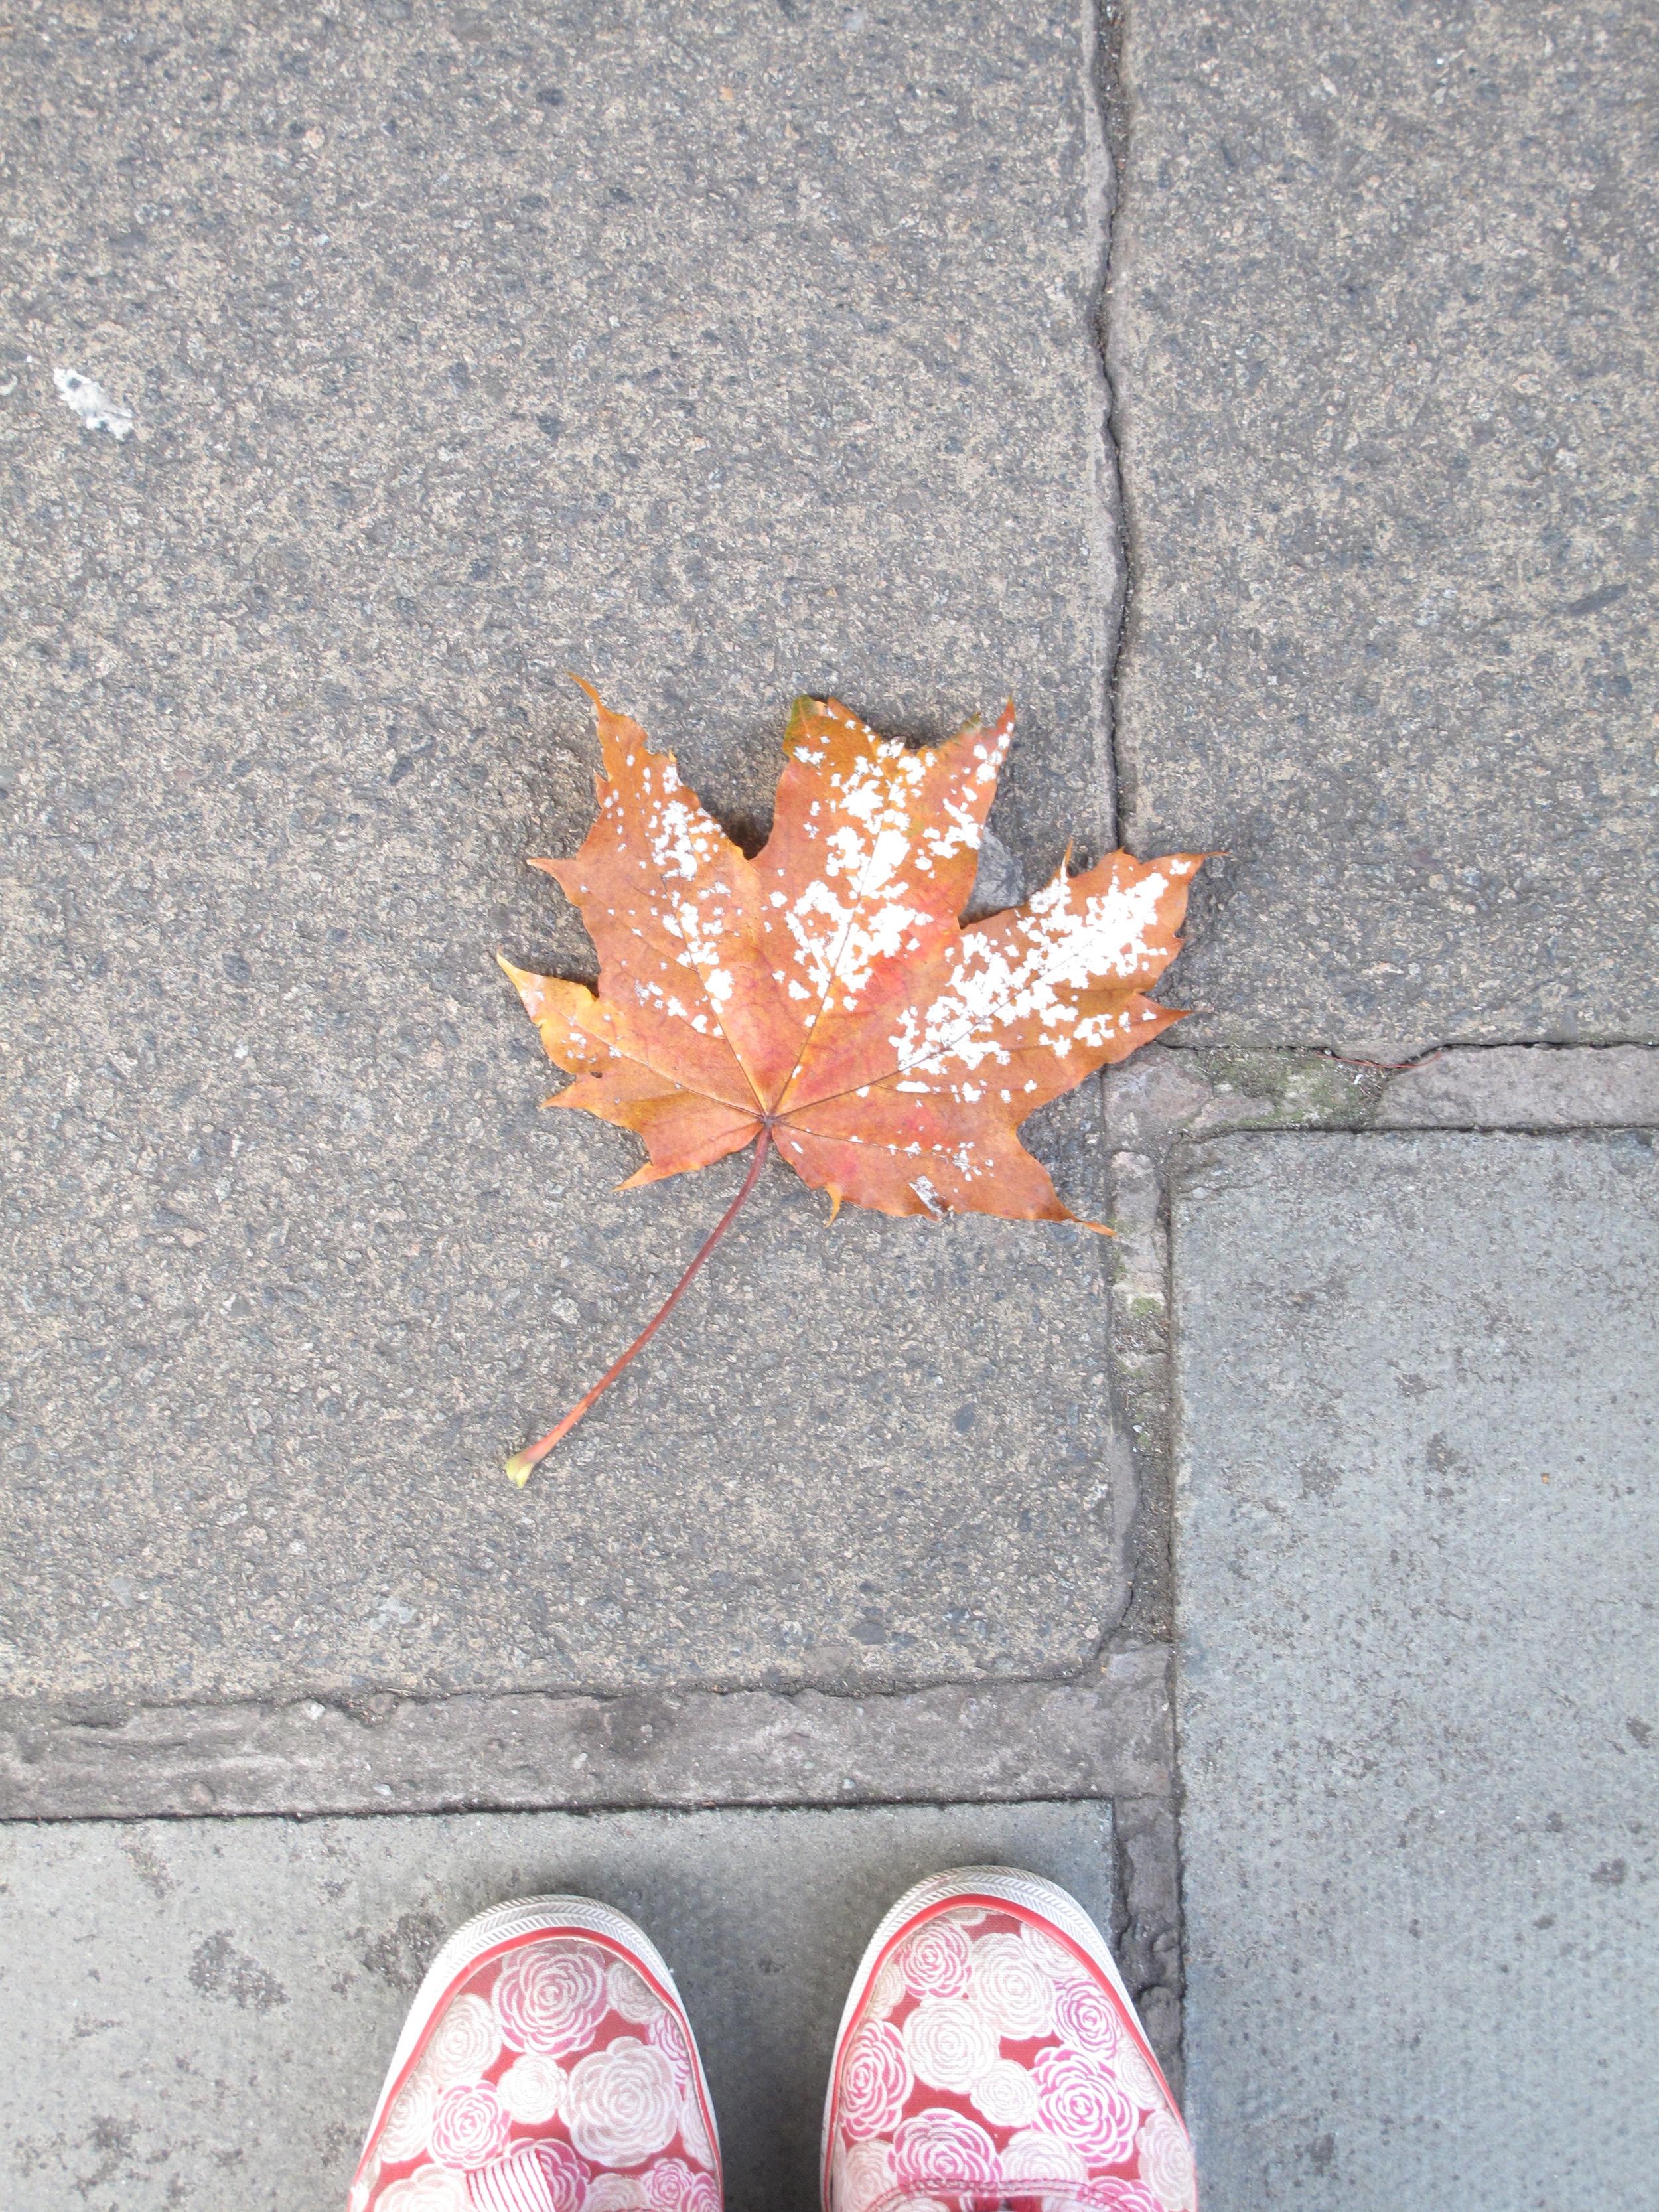 Autumn leaf on the stone pavement in Edinburgh